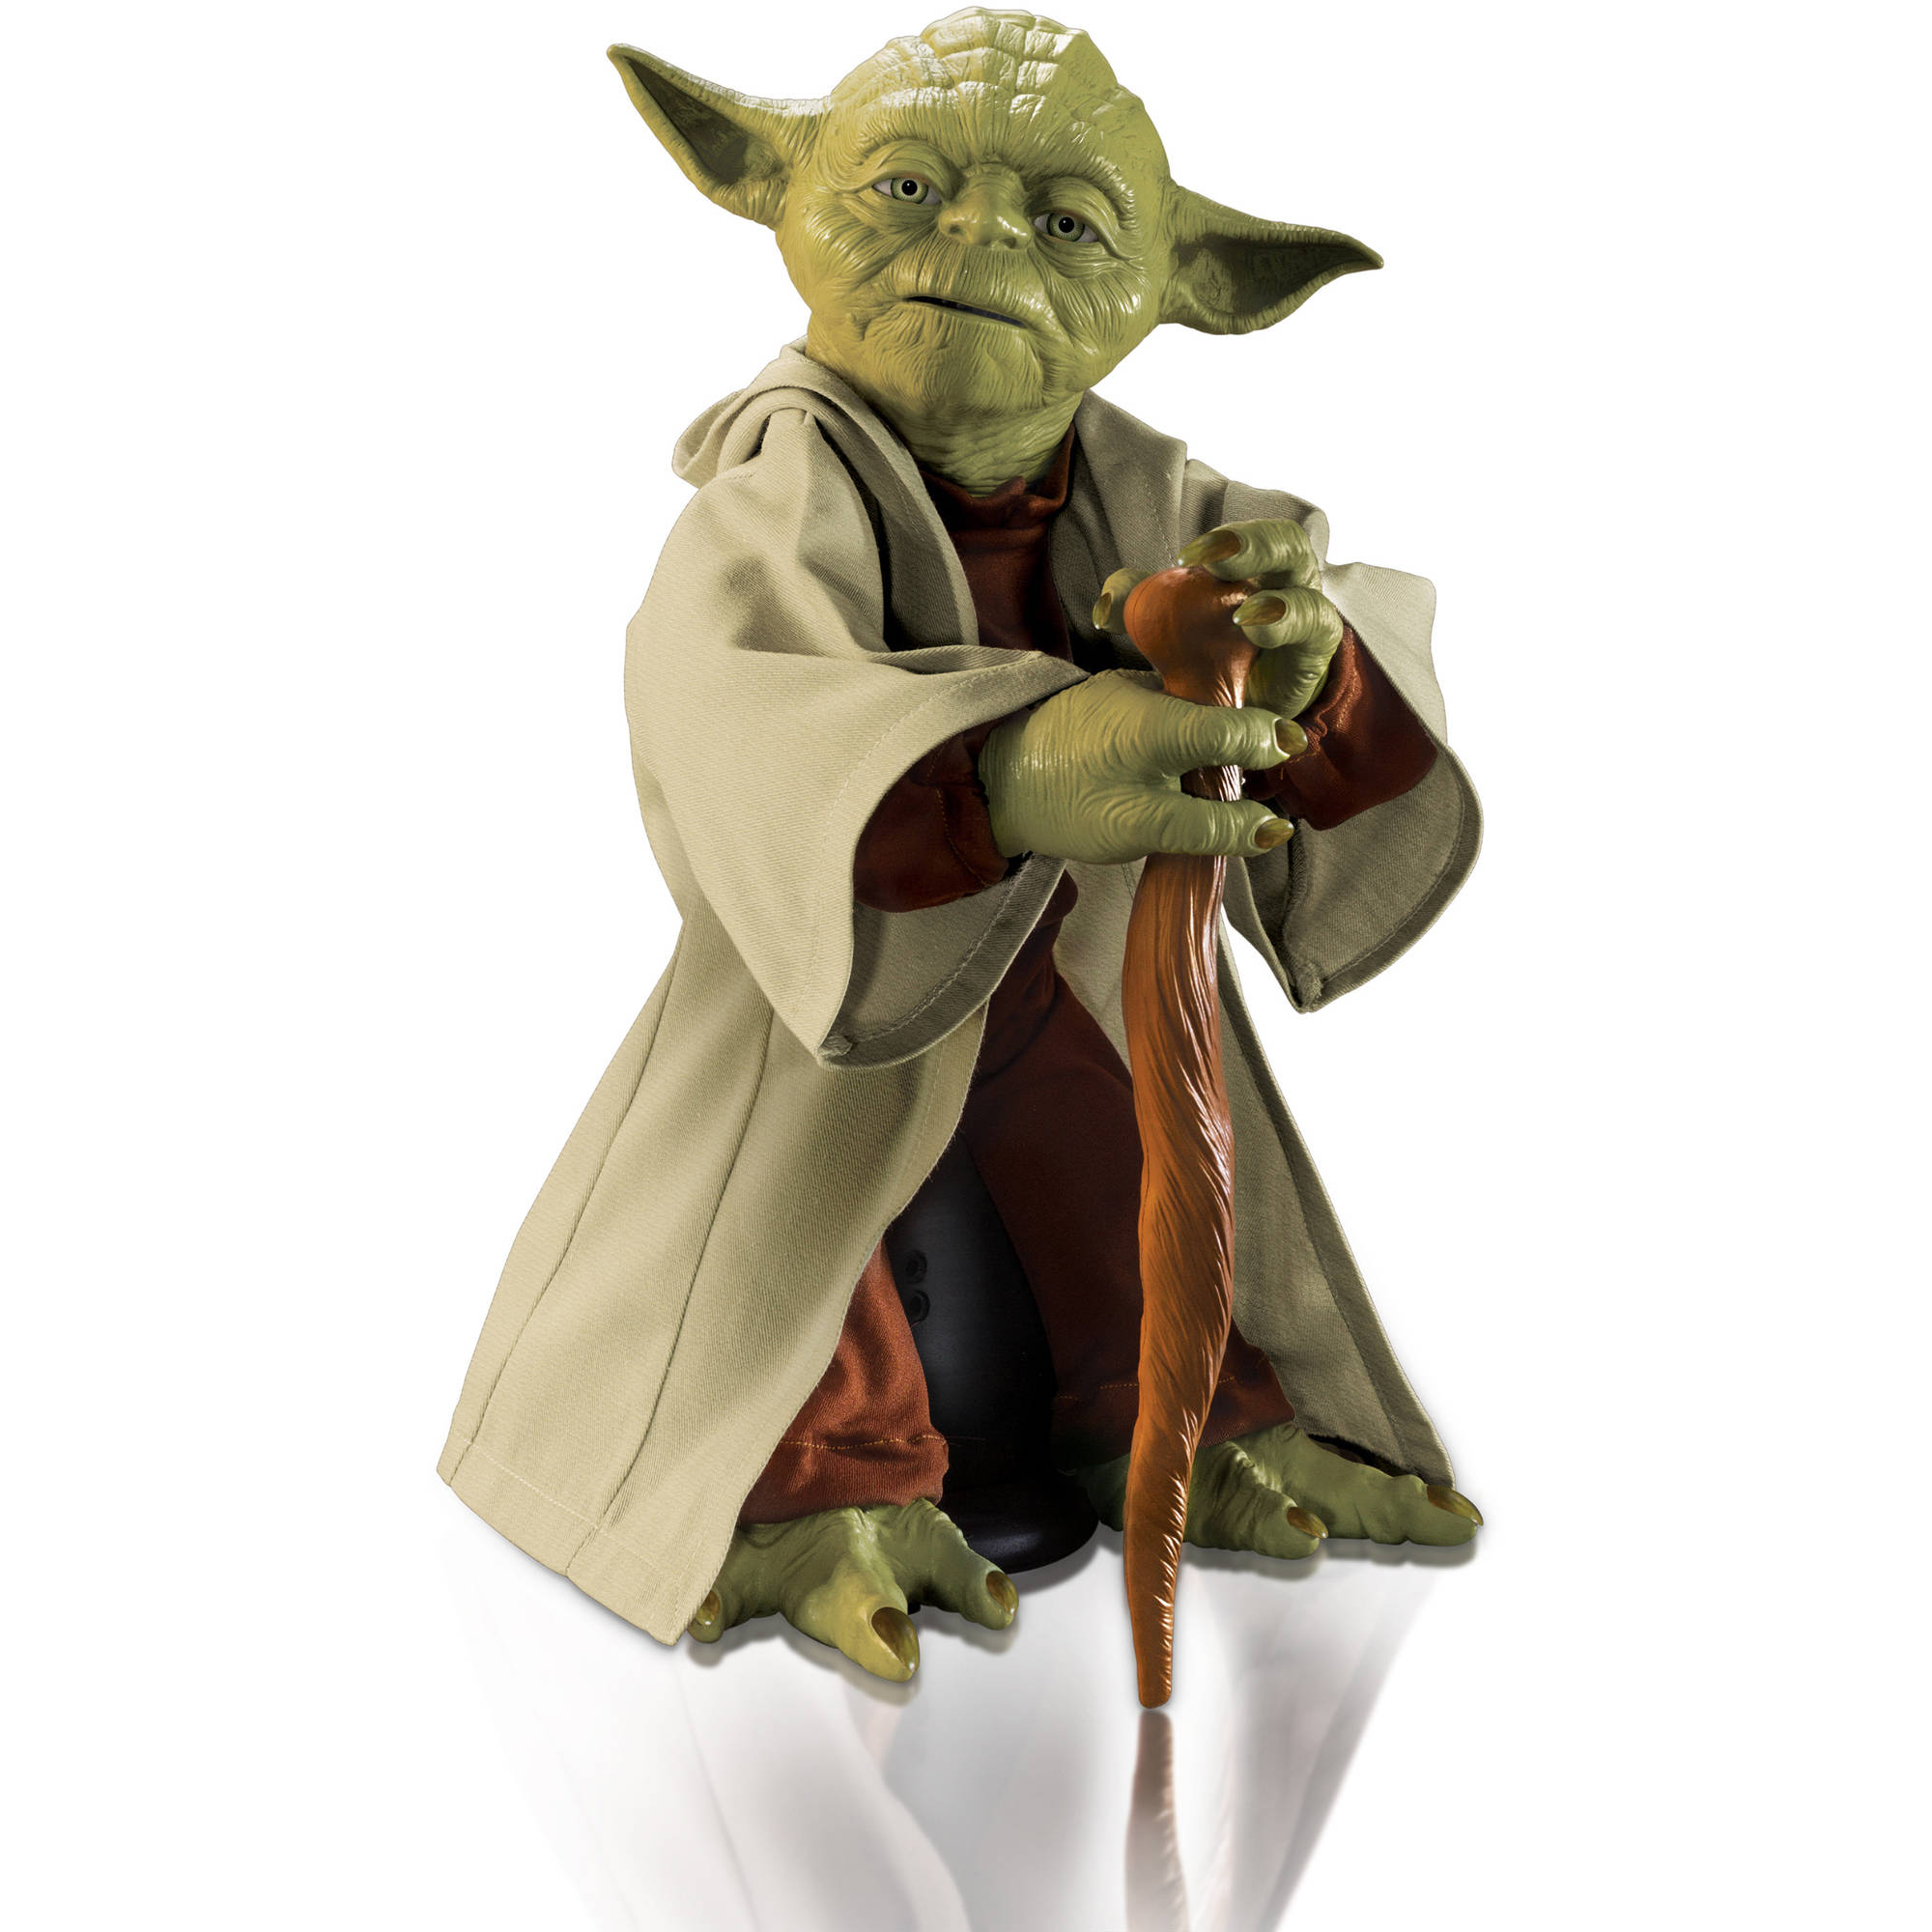 Star Wars Legendary Jedi Master Yoda Walmart